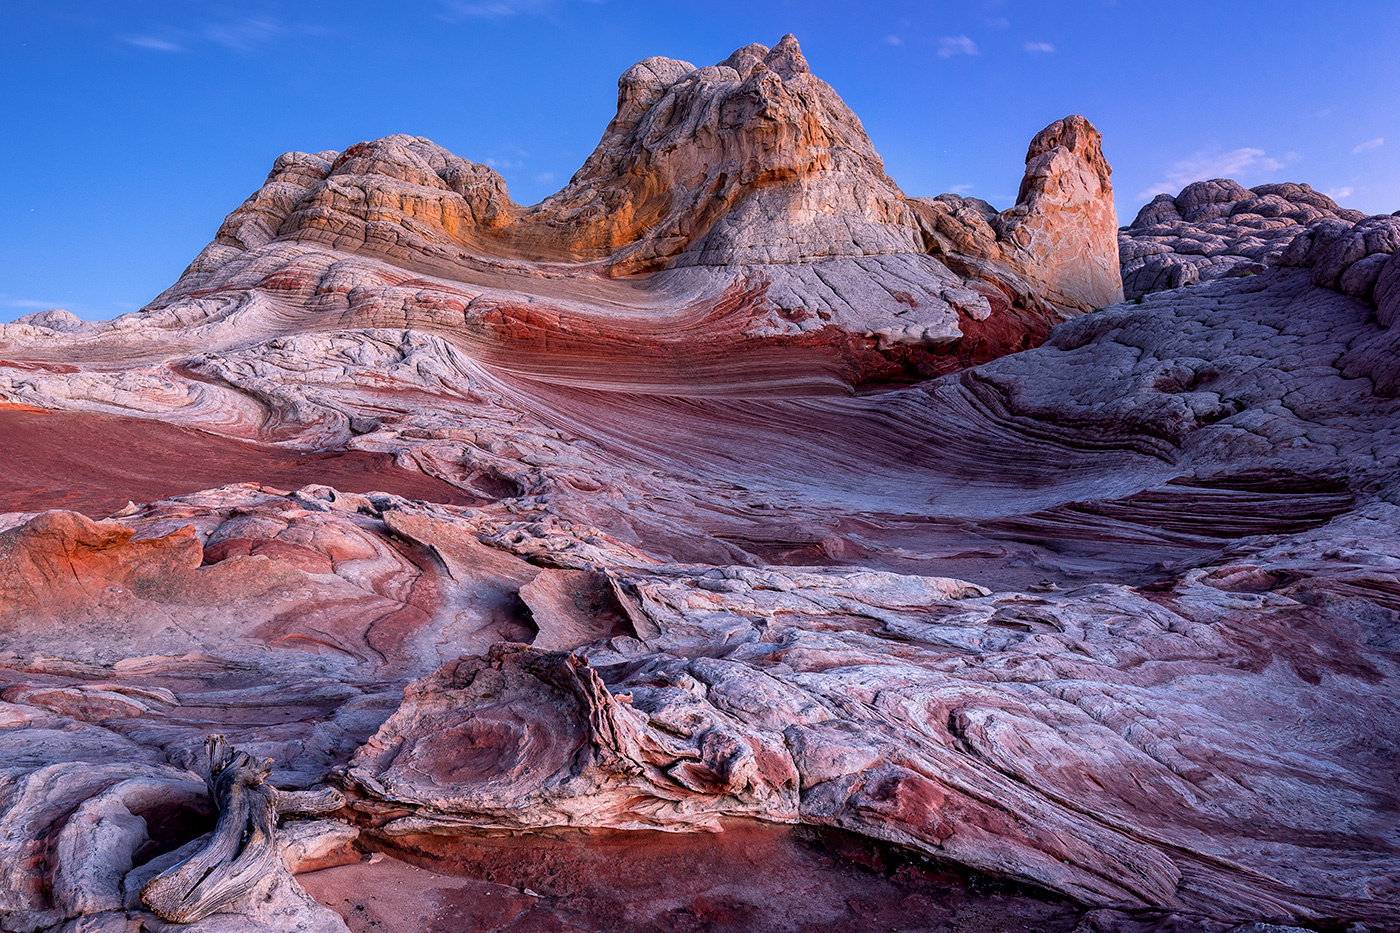 blue hour on Mars by Greg Cichecki